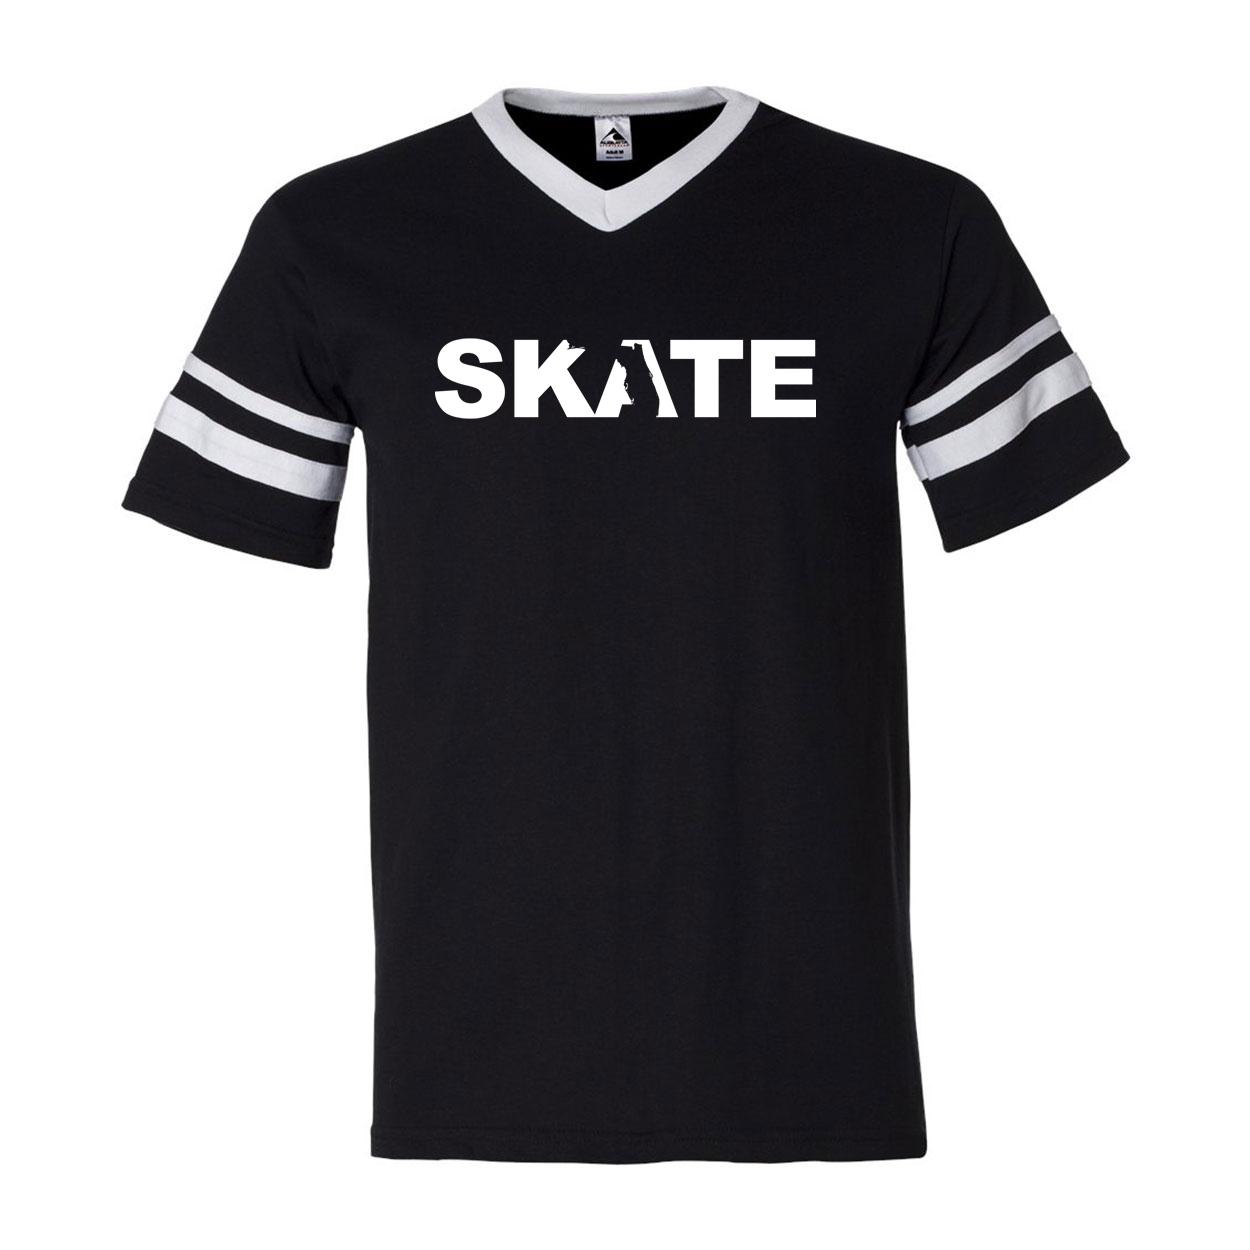 Skate Florida Classic Premium Striped Jersey T-Shirt Black/White (White Logo)